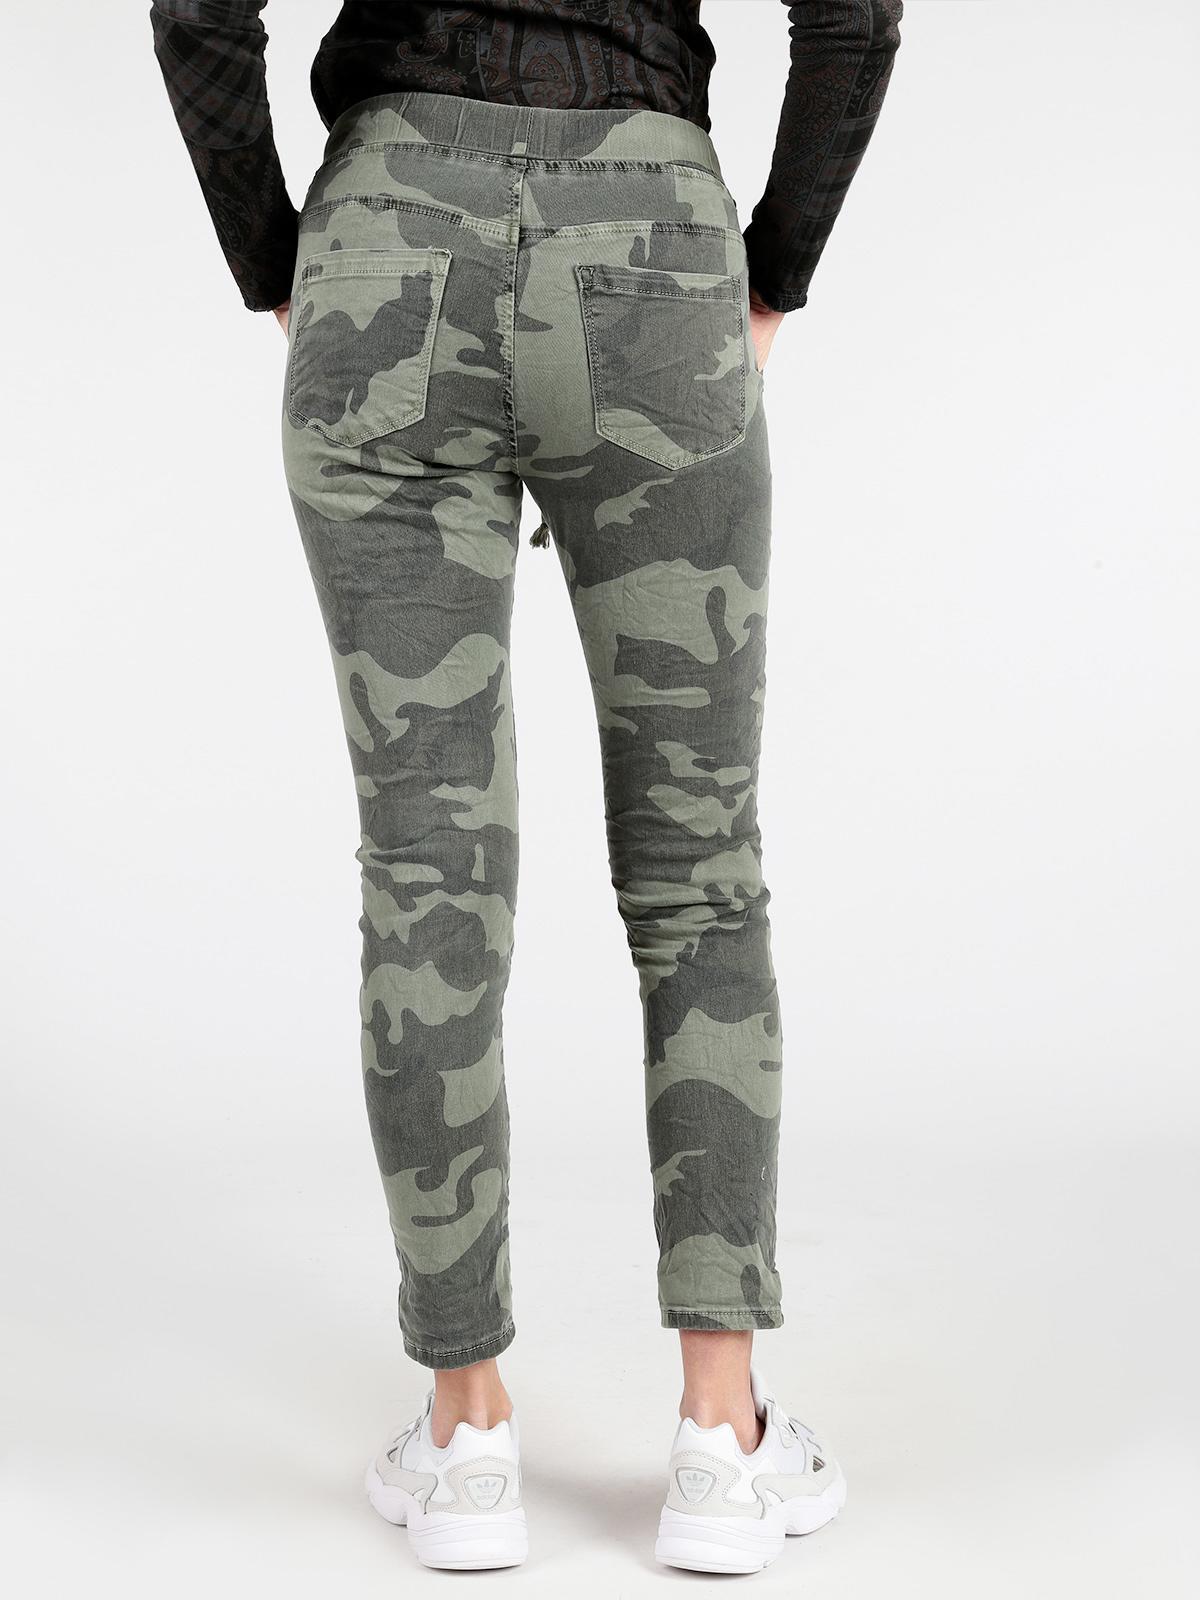 molto carino 5c590 acfd2 Pantaloni mimetici smagli   MecShopping